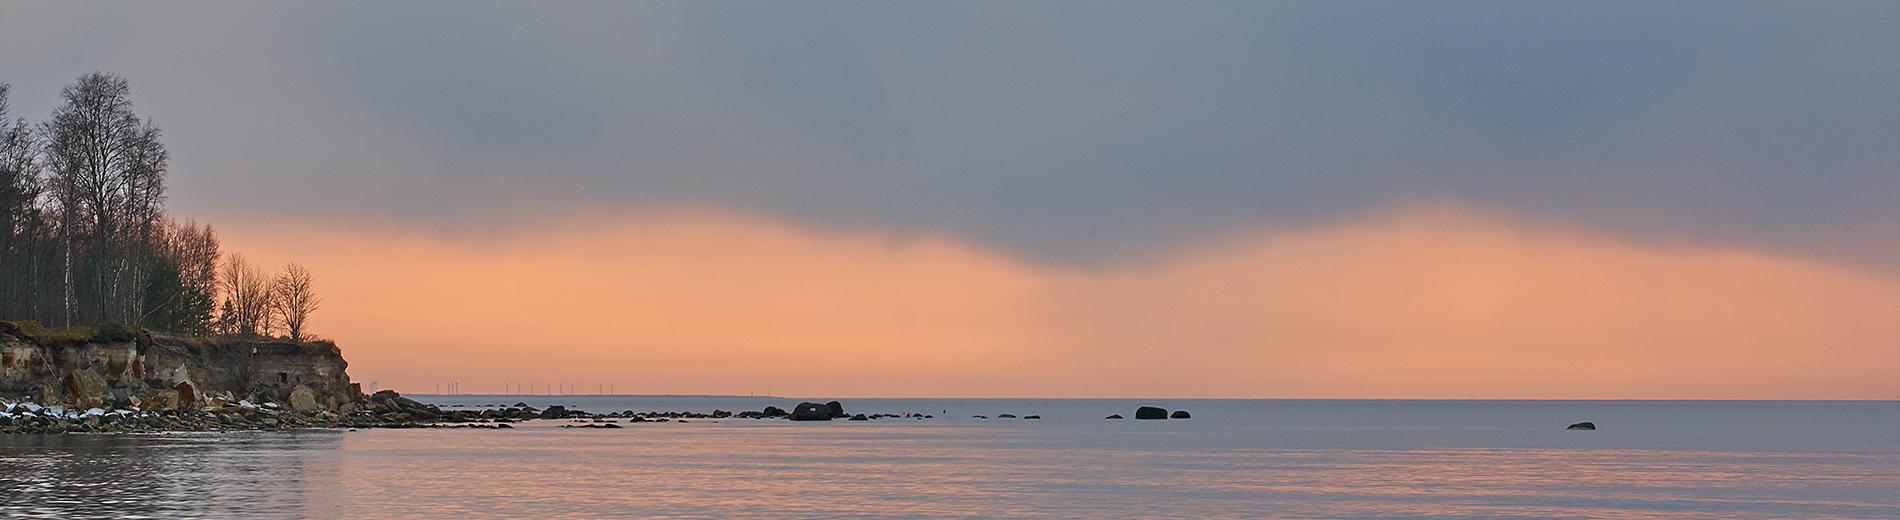 Päikeseloojang Ninamaal